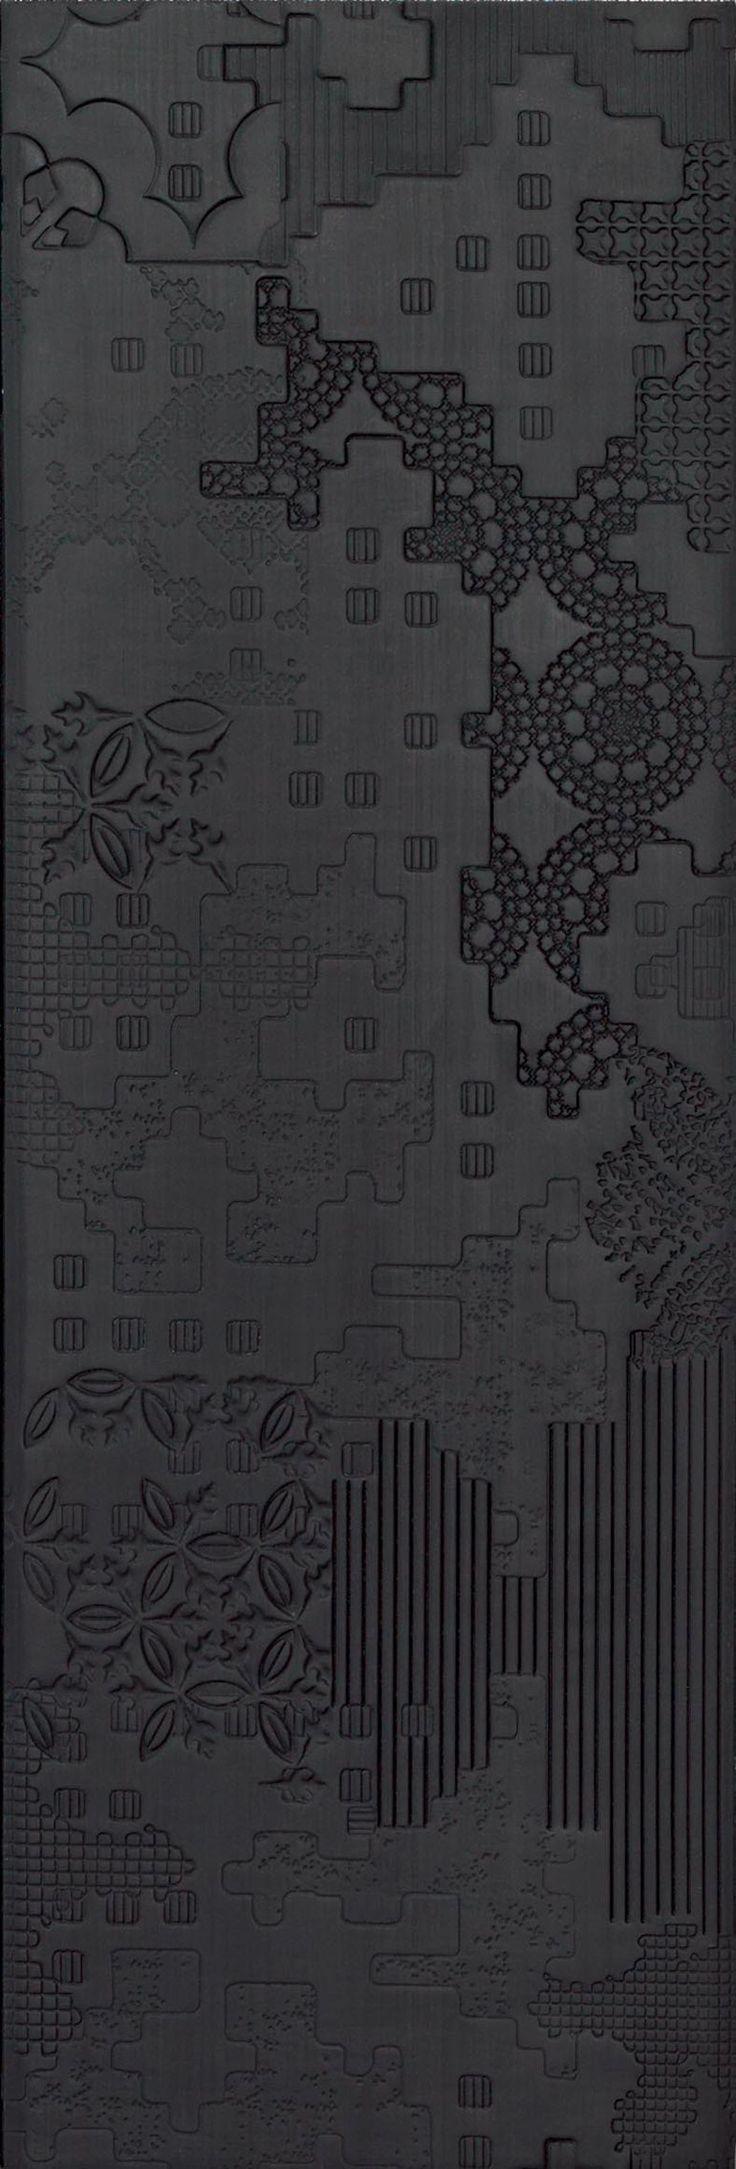 Indoor porcelain stoneware wall/floor tiles BAS-RELIEF PATCHWORK NERO by MUTINA | #design Patricia Urquiola #black